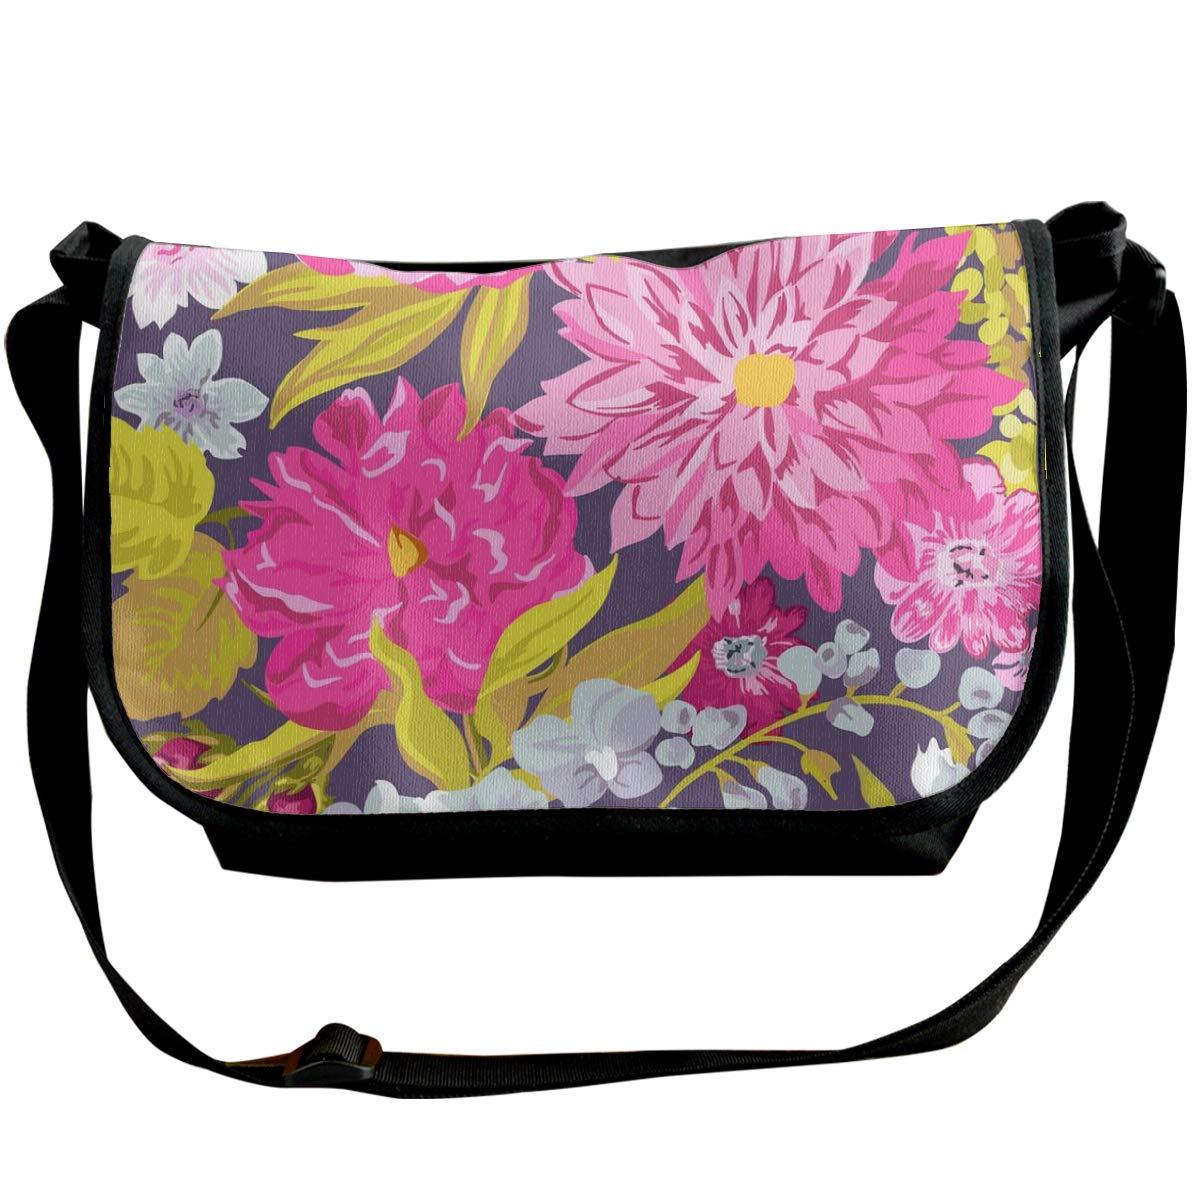 Taslilye Vintage Floral Background Seamless Pattern Customized Wide Crossbody Shoulder Bag For Men And Women For Daily Work Or Travel